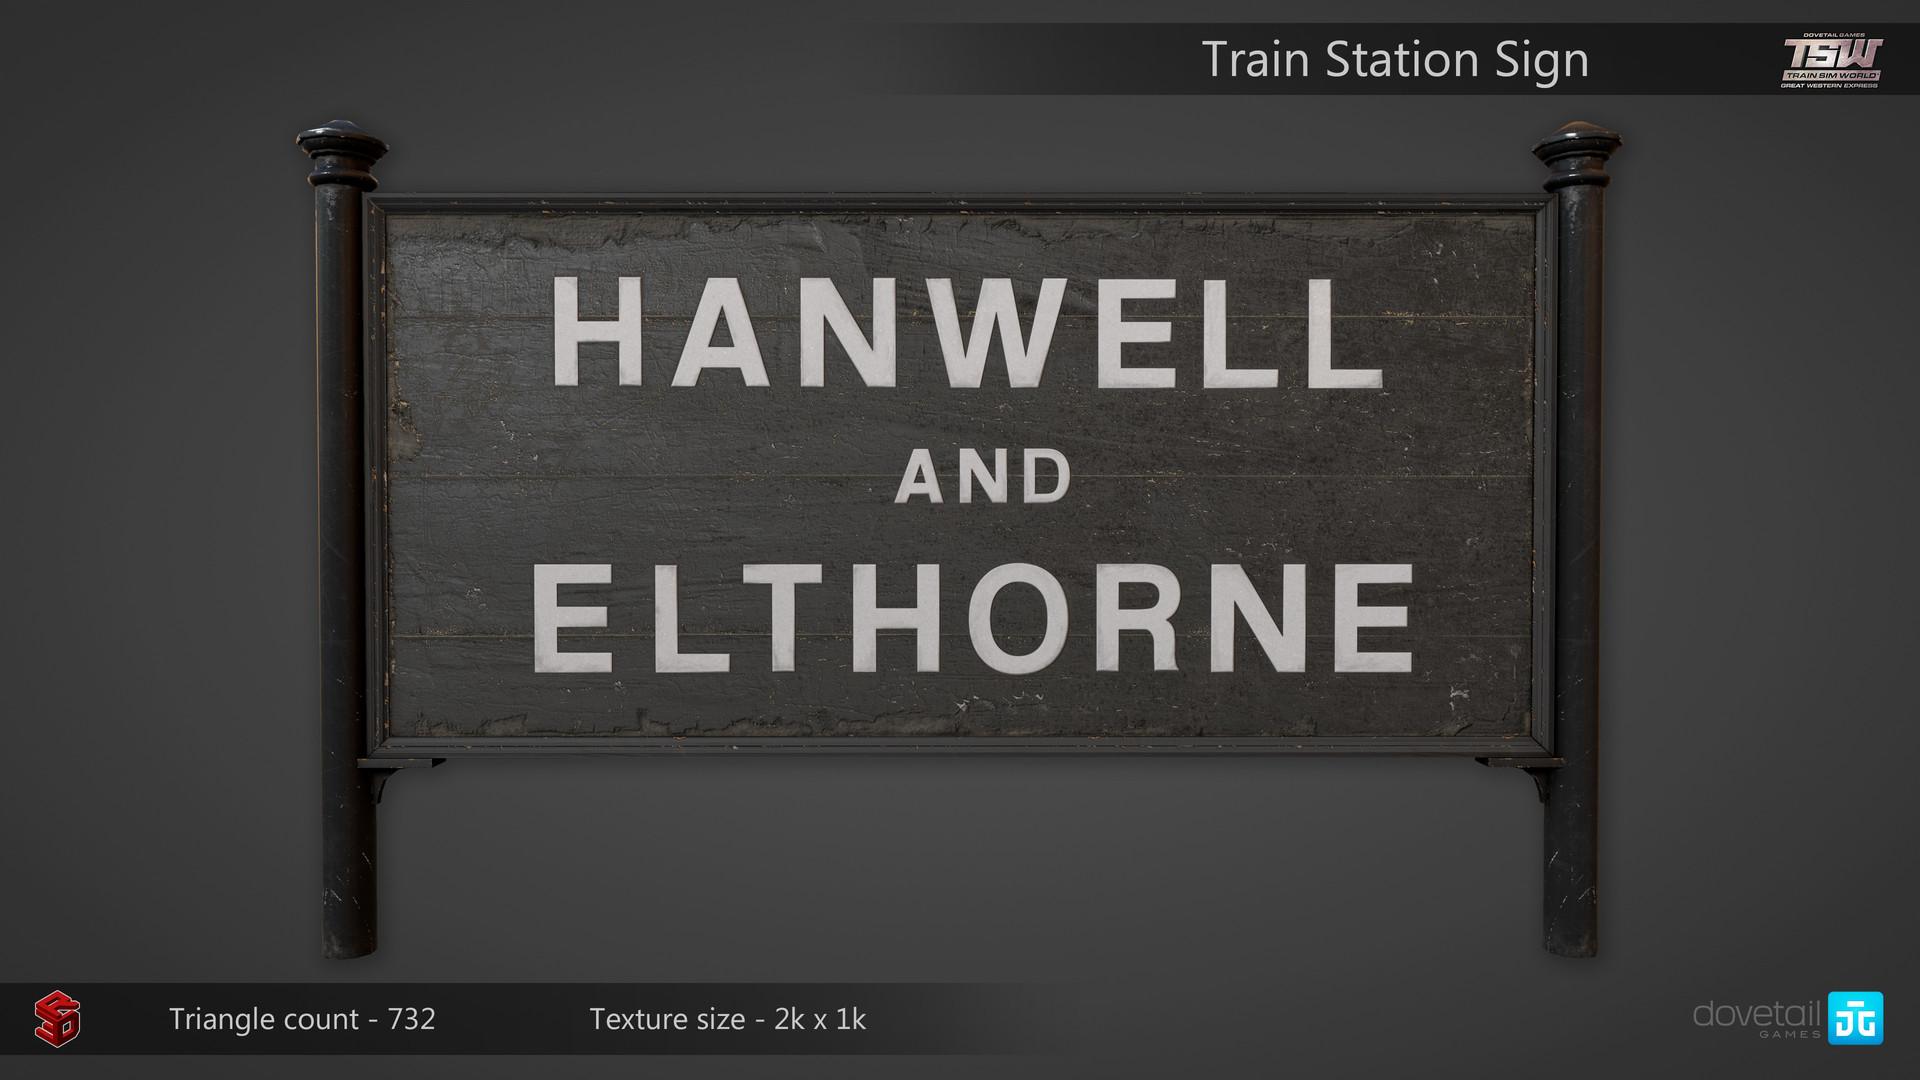 Ross mccafferty trainstationsign 02